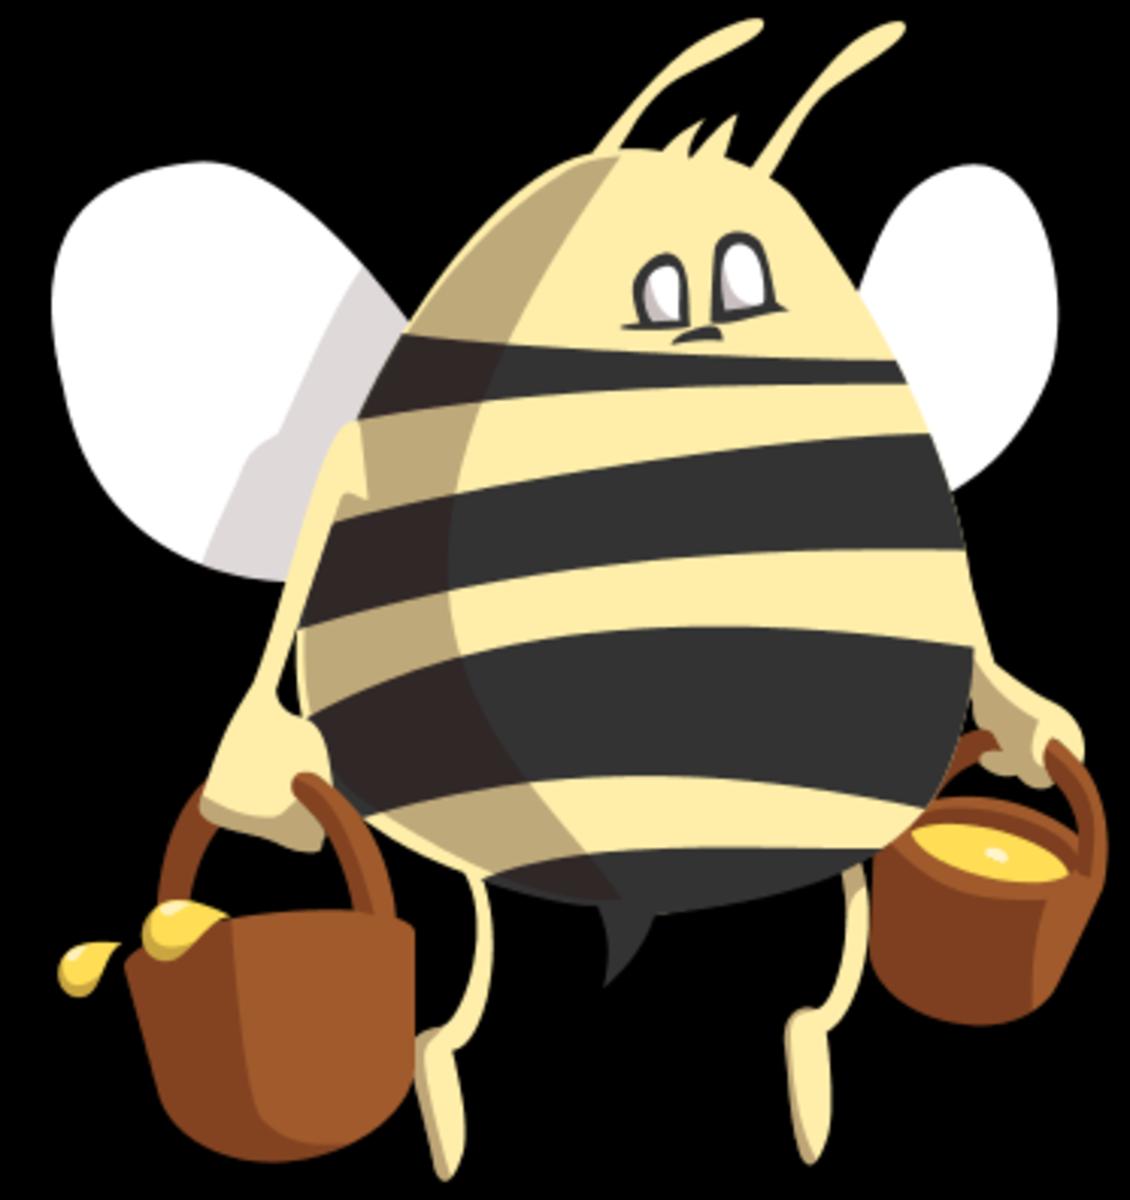 Bee bringing buckets of honey